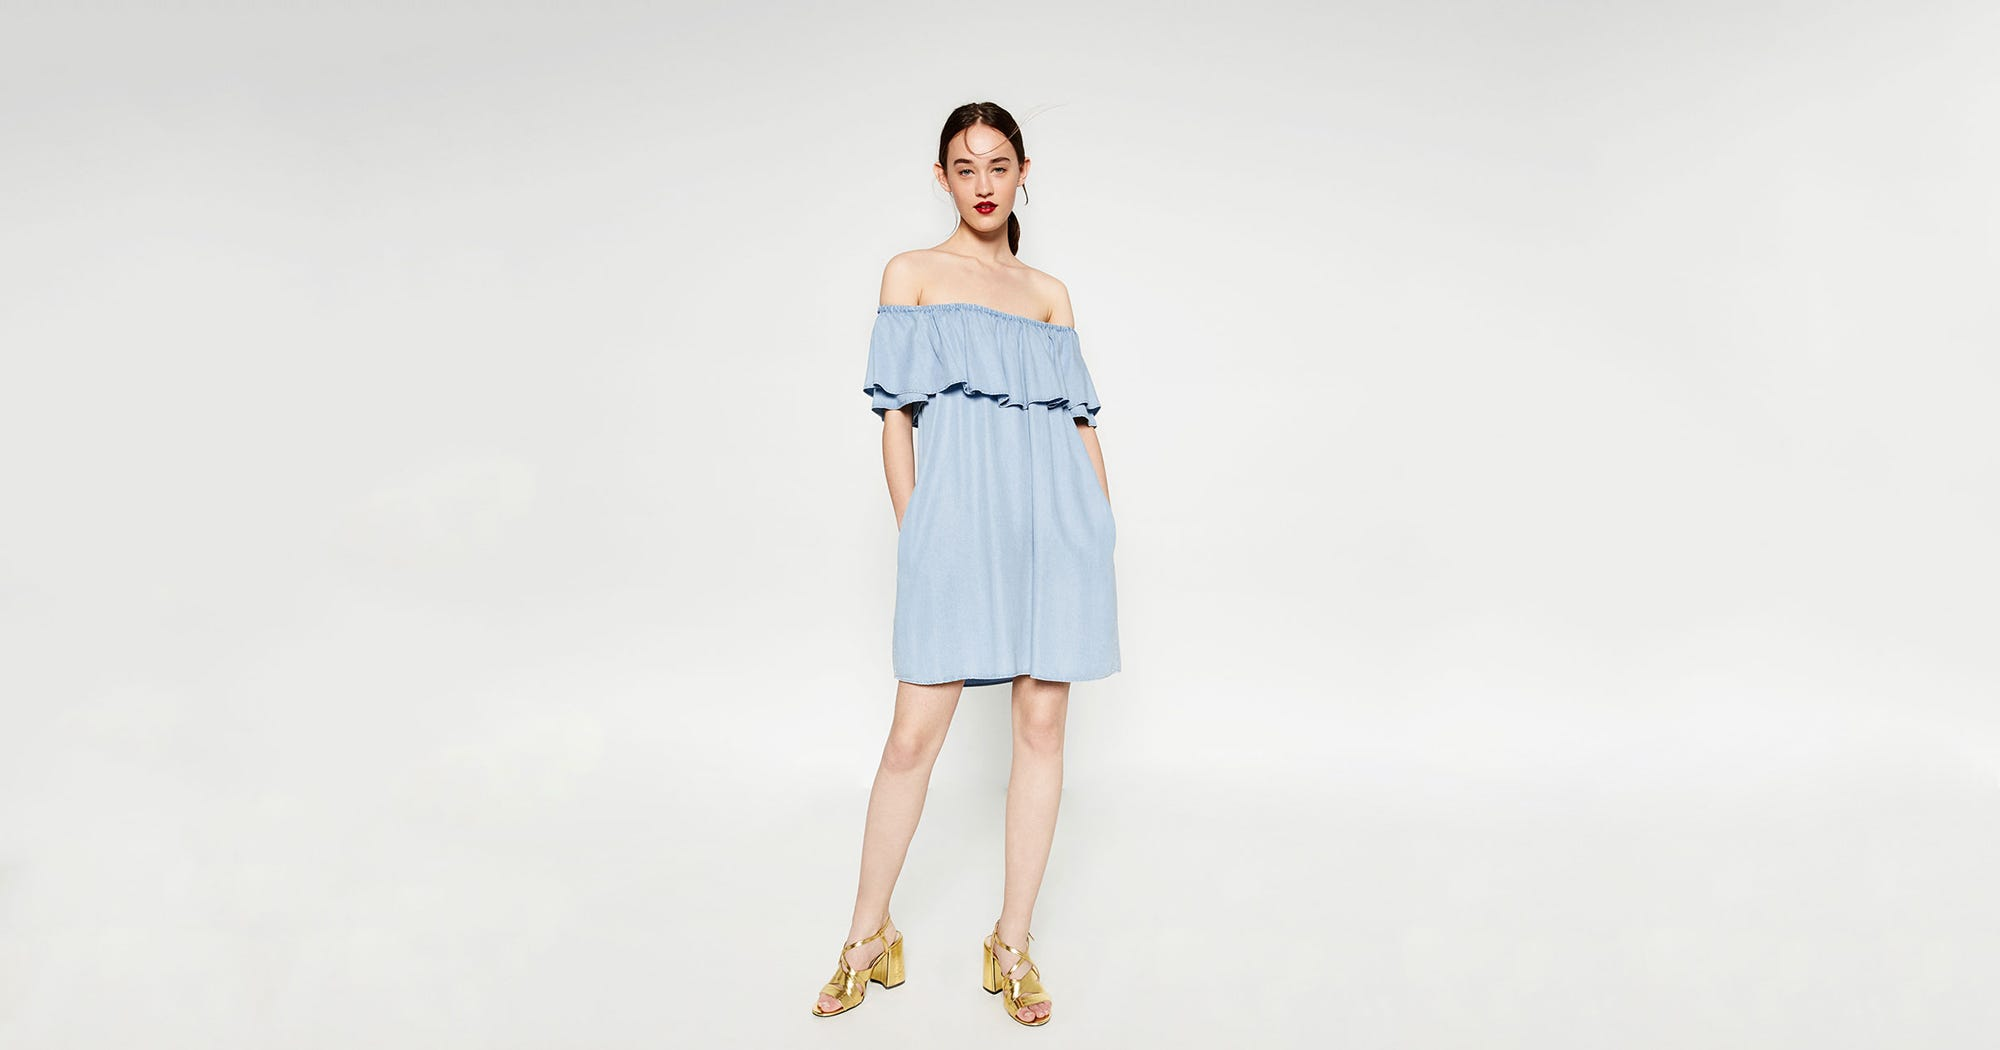 6f71e3802ad Zara Popular Dress Funny Blog Off The Shoulder Trend